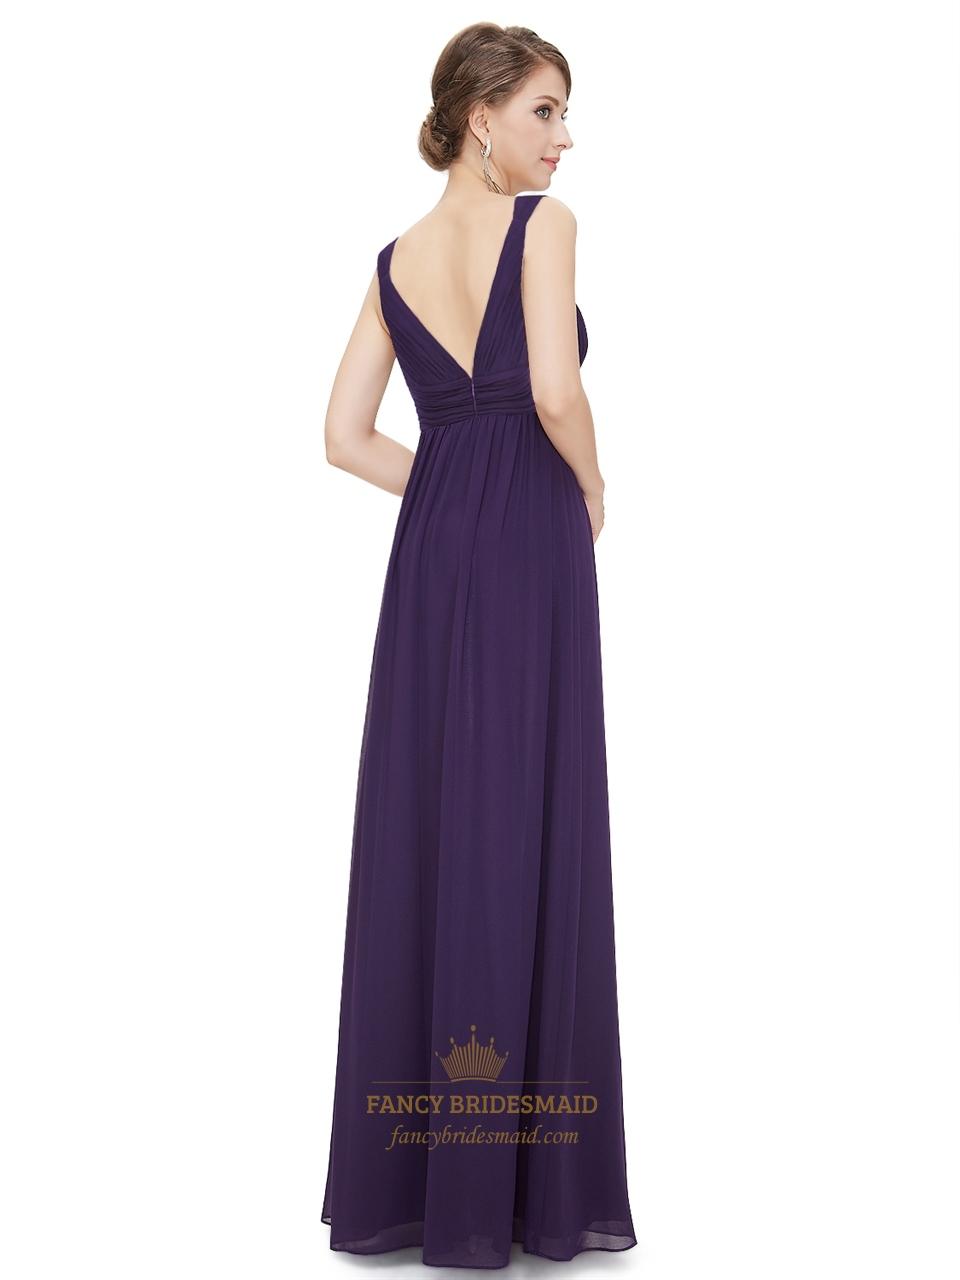 Purple chiffon bridesmaid dress 1358988 - laana-pengar.info